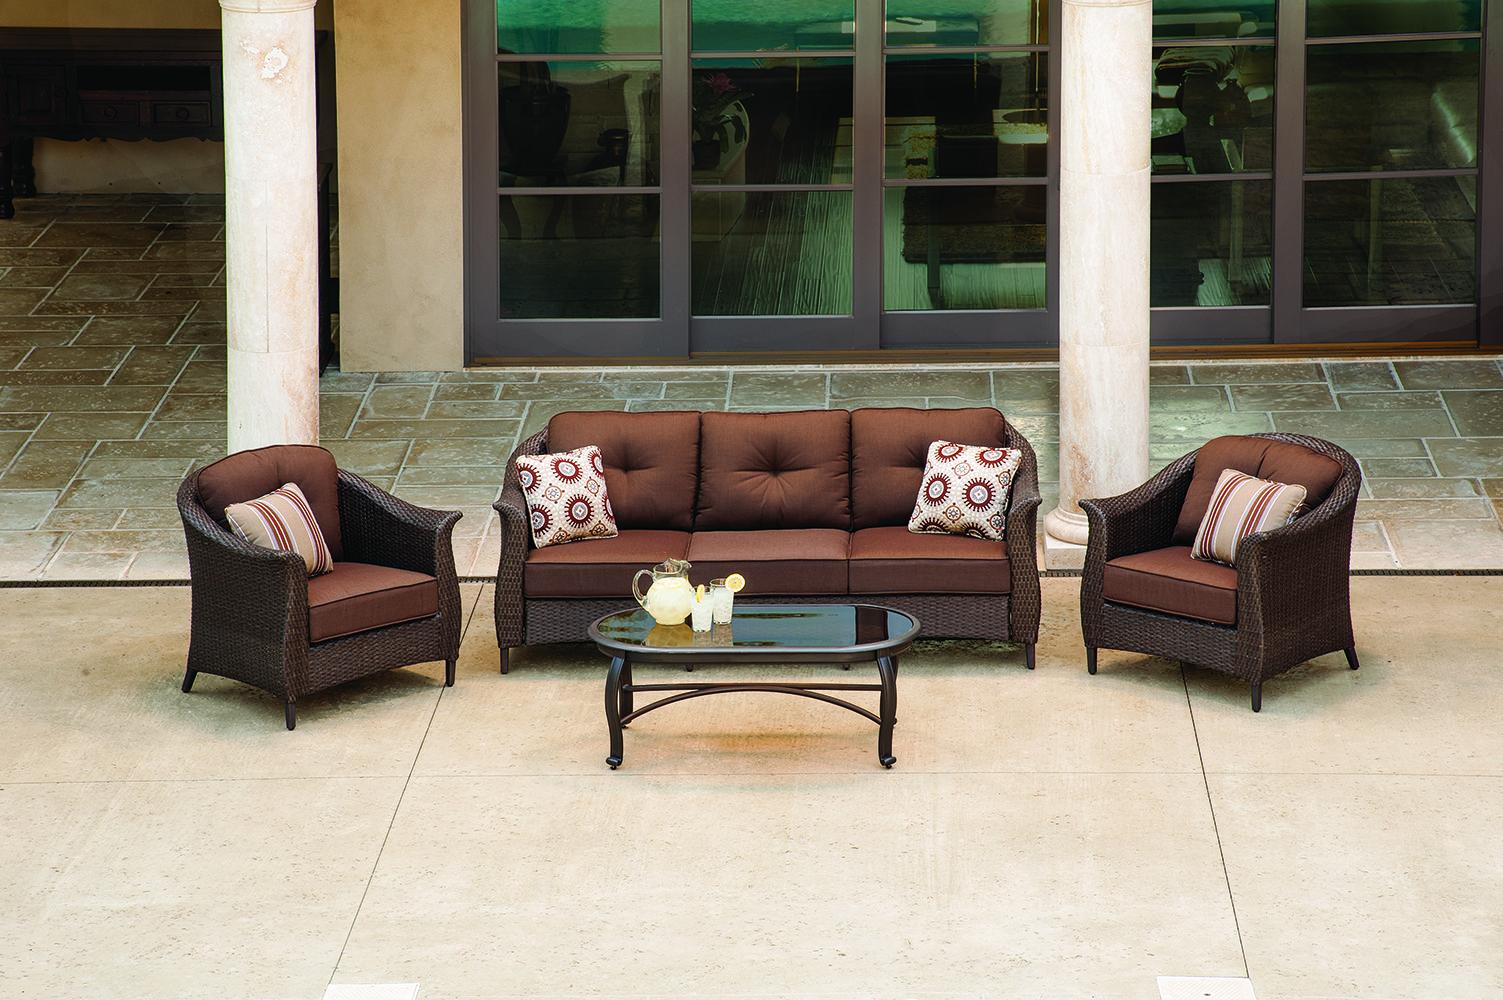 La Z Boy Outdoor S Eva Seating Collection Deep Seating Wicker Patio Set Patio Seating Sets